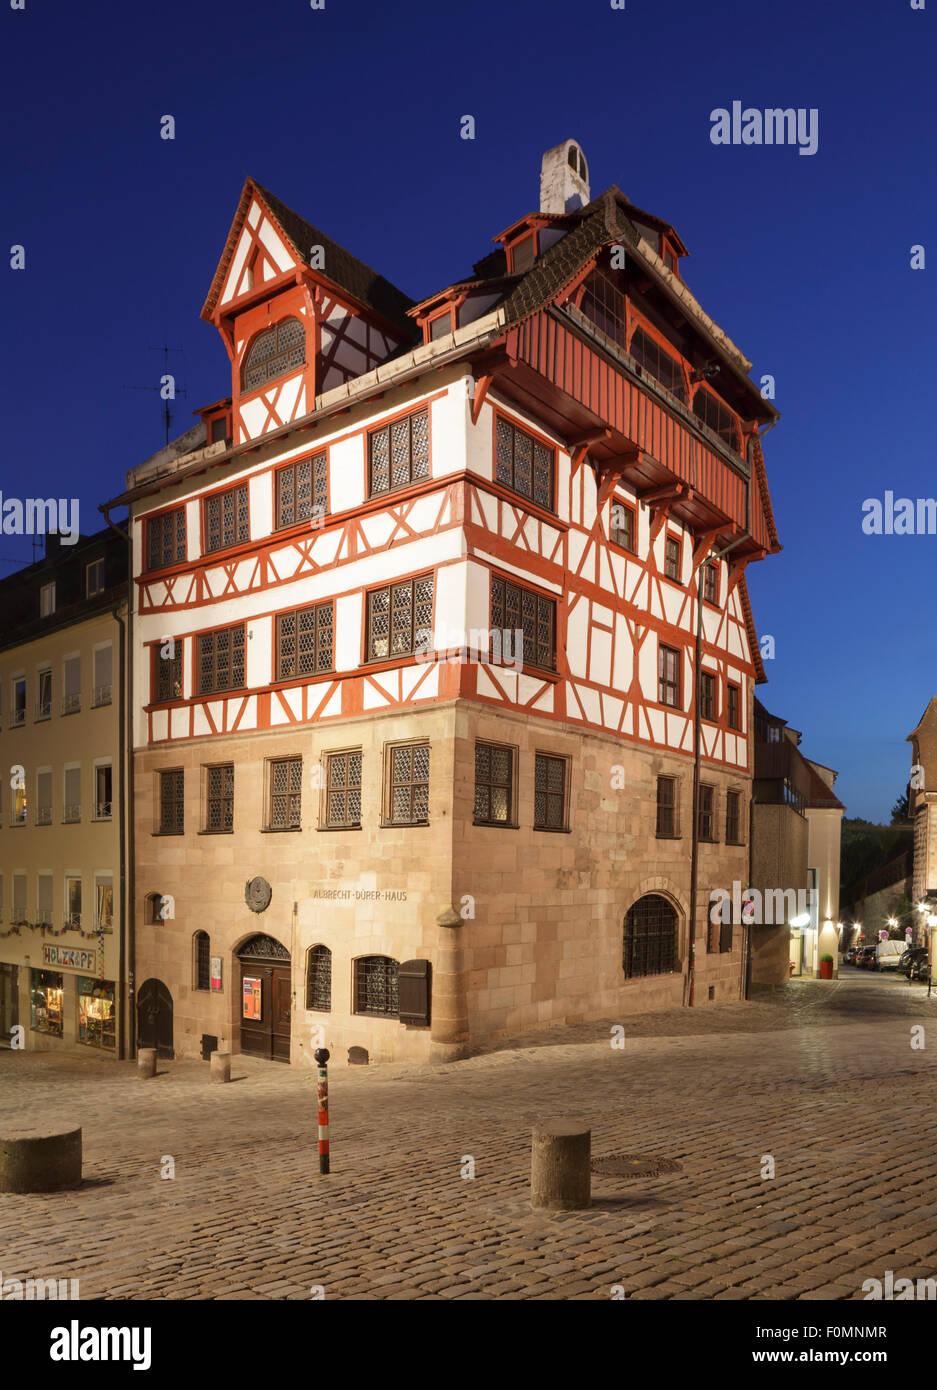 Albrecht-Dürer-Haus, Nürnberg, Bayern, Deutschland Stockbild